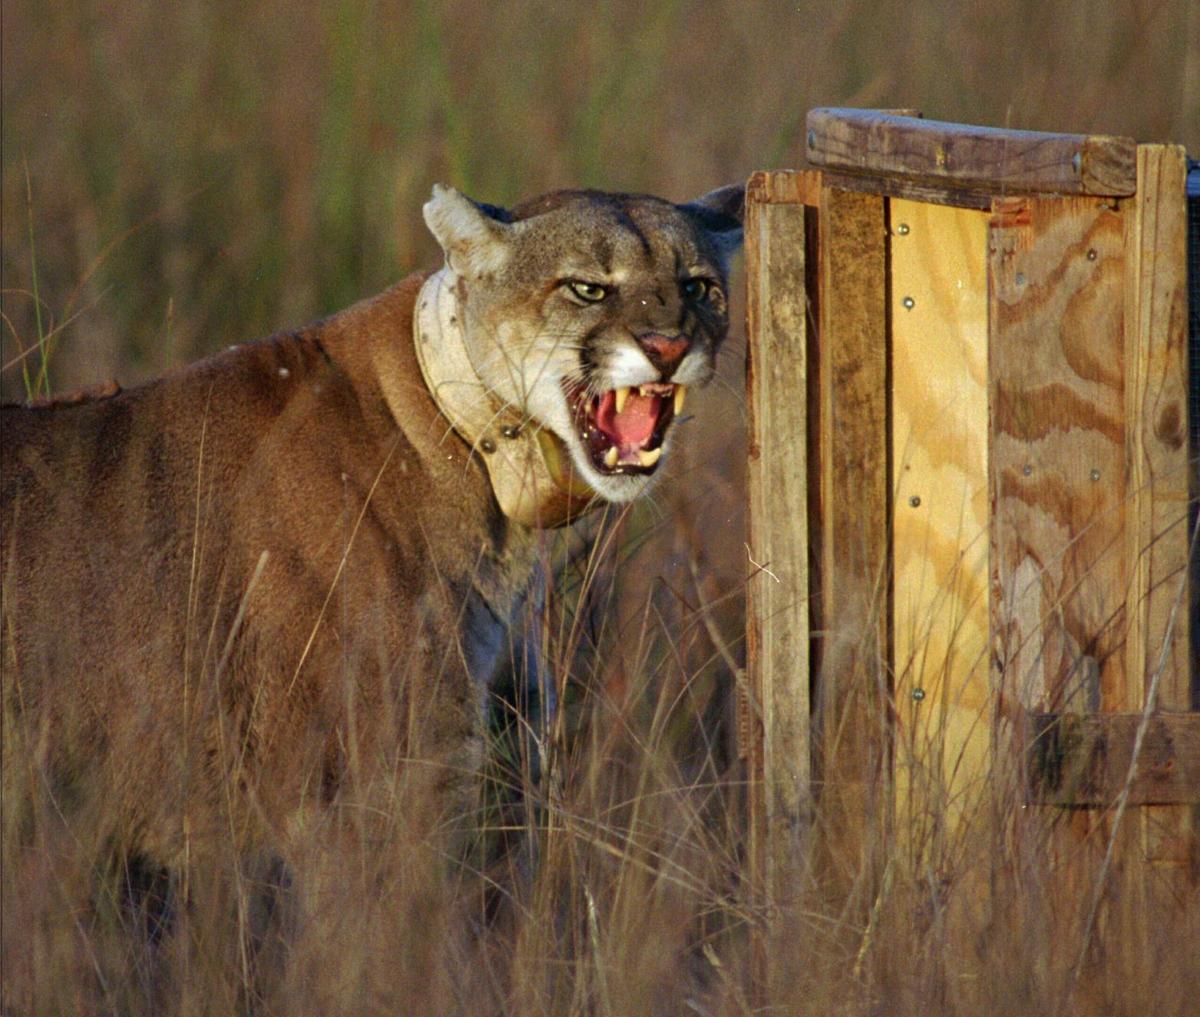 Panther is extinct, not endangered, regulators say